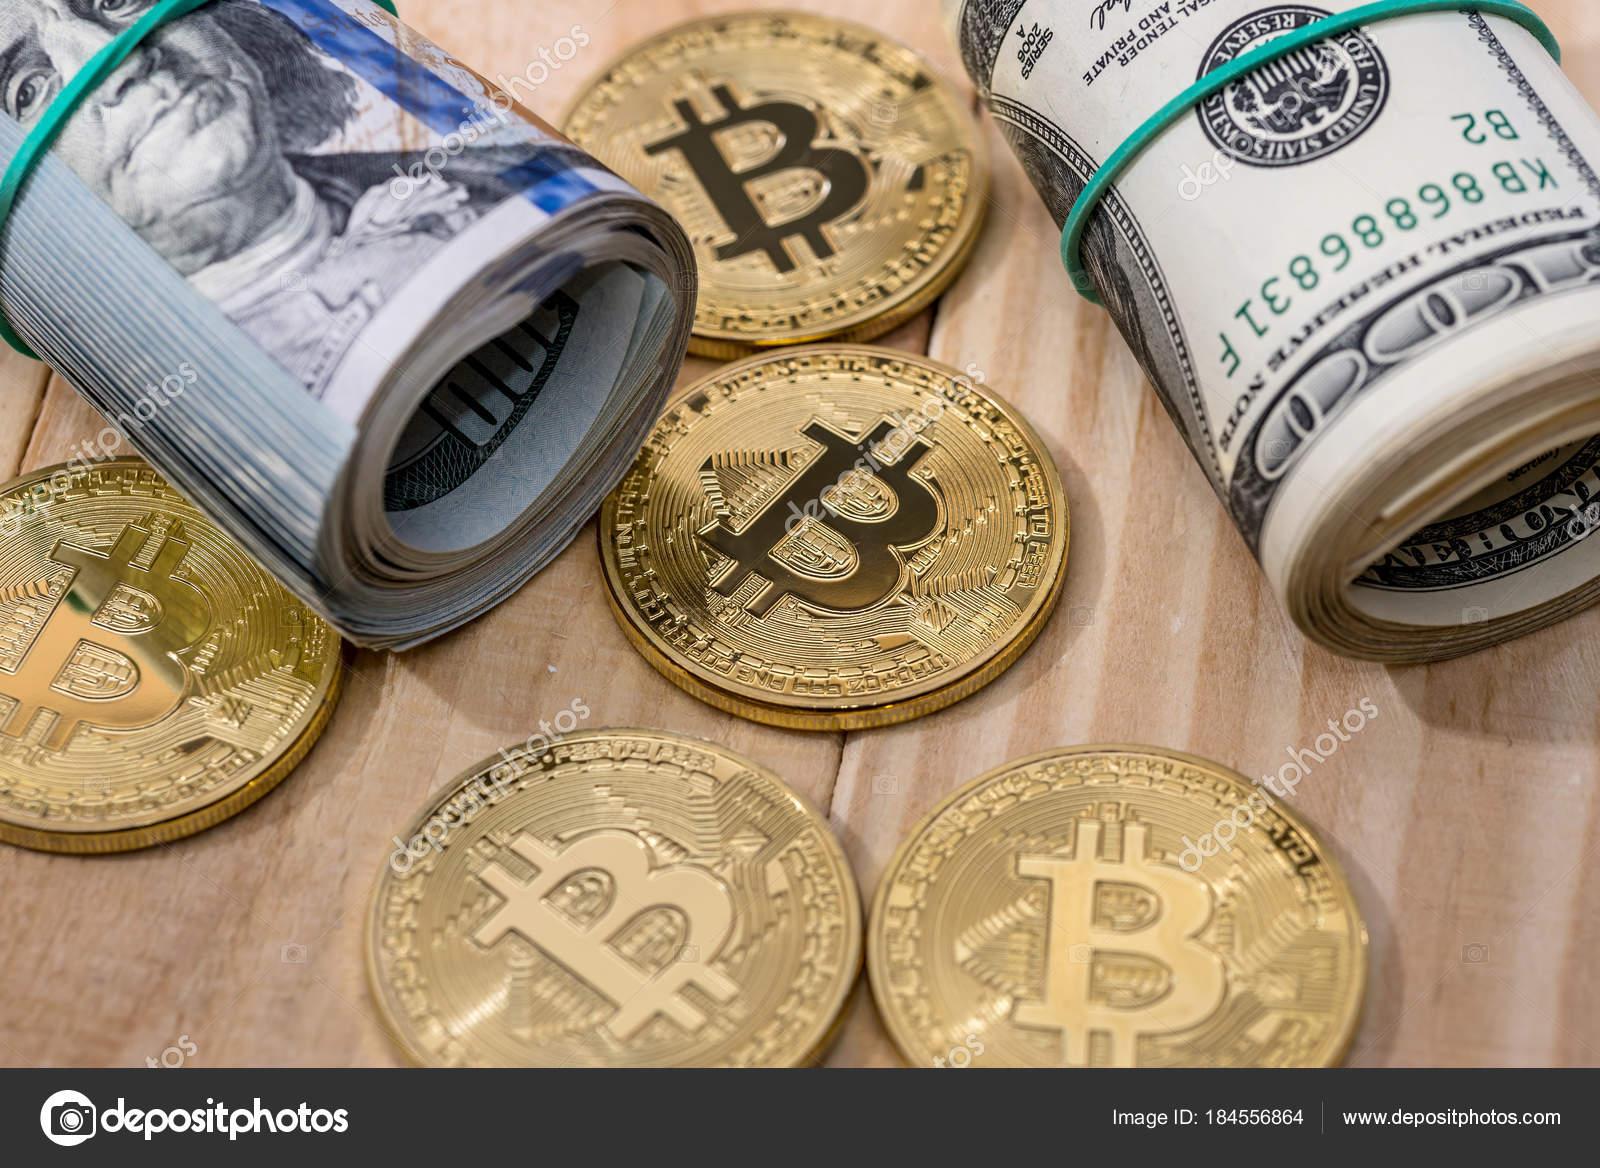 Br investing bitcoin dolar